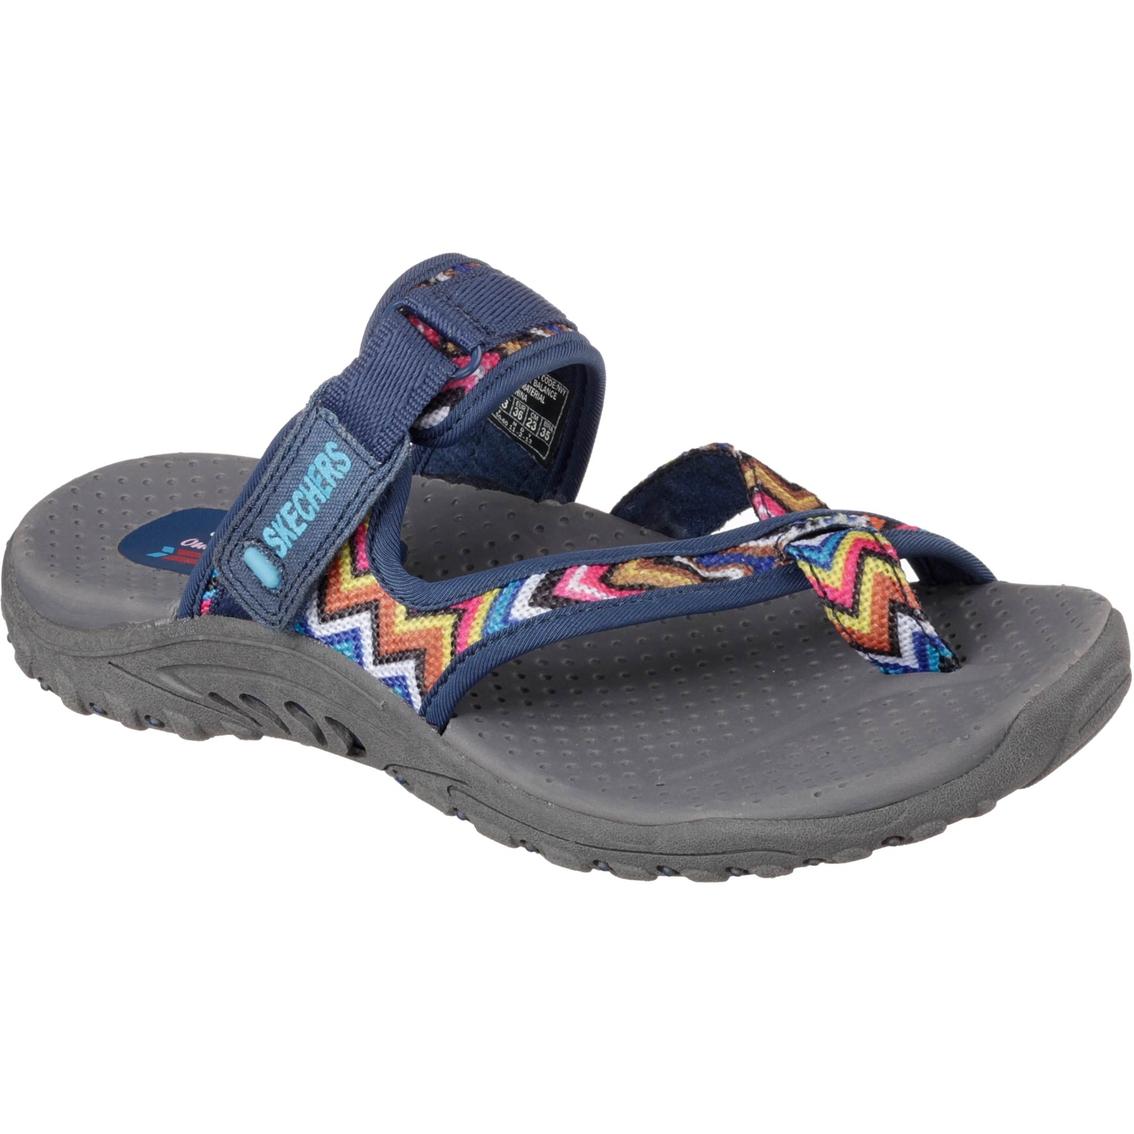 315d20745ab3 Skechers Women s Reggae Zig Swag Sandals